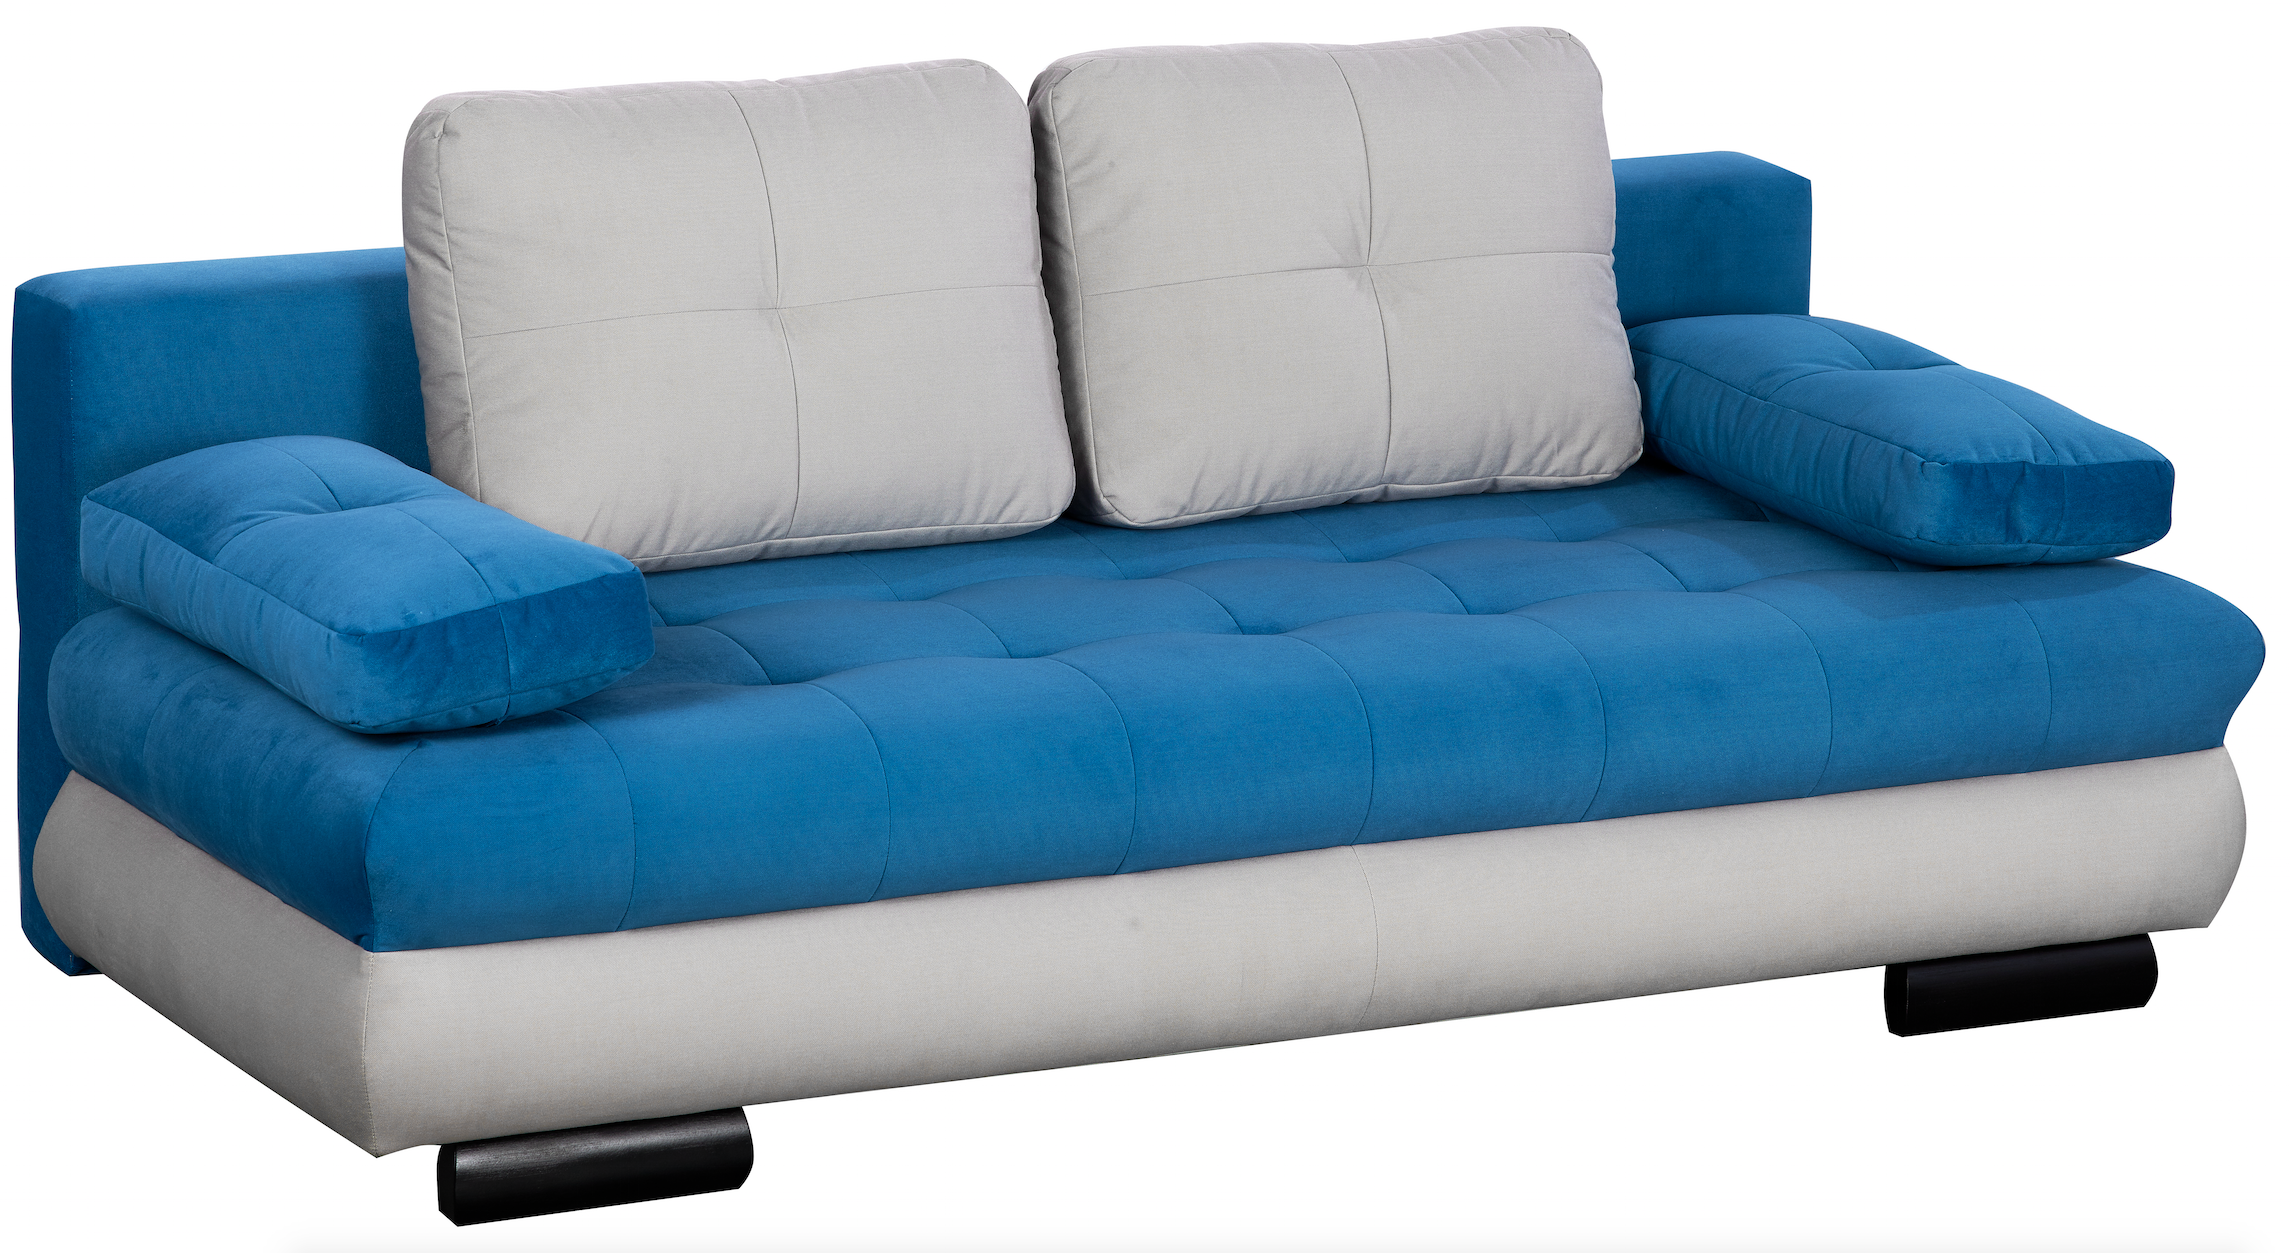 Canapea extensibila 3 locuri Luore Light Blue